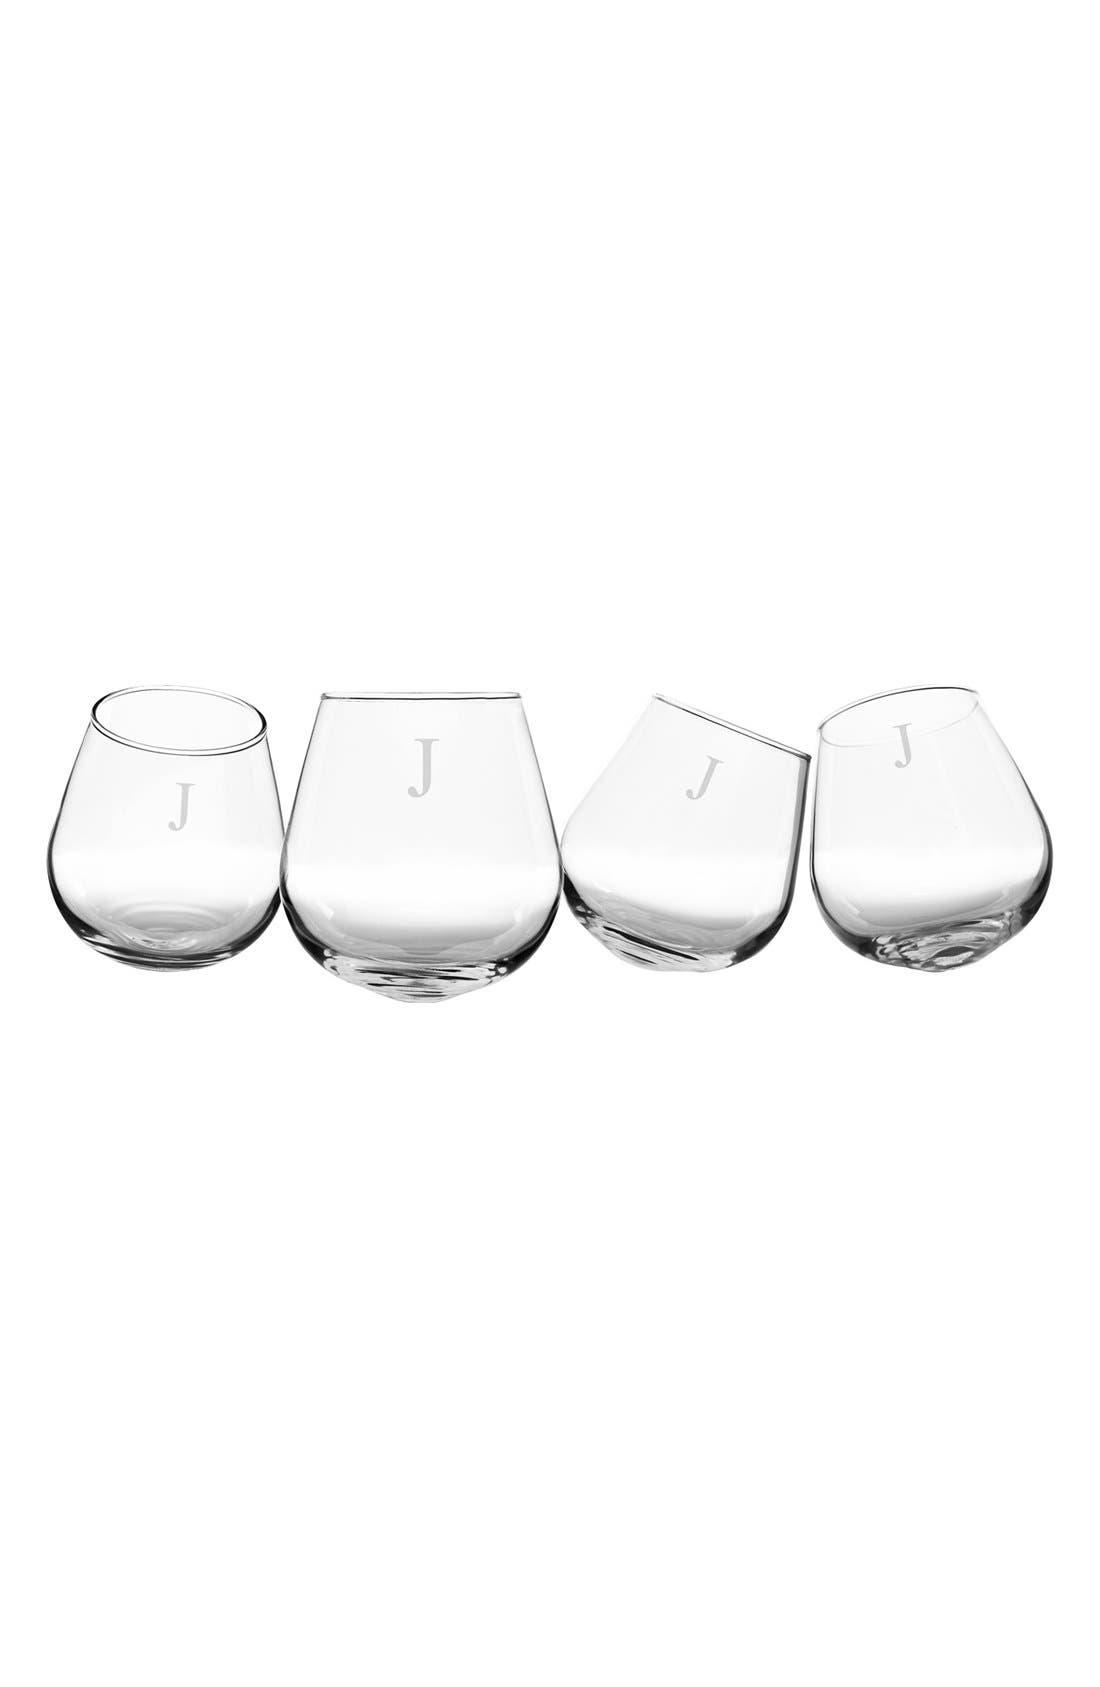 Monogram Tipsy Set of 4 Wine Glasses,                         Main,                         color, Clear J